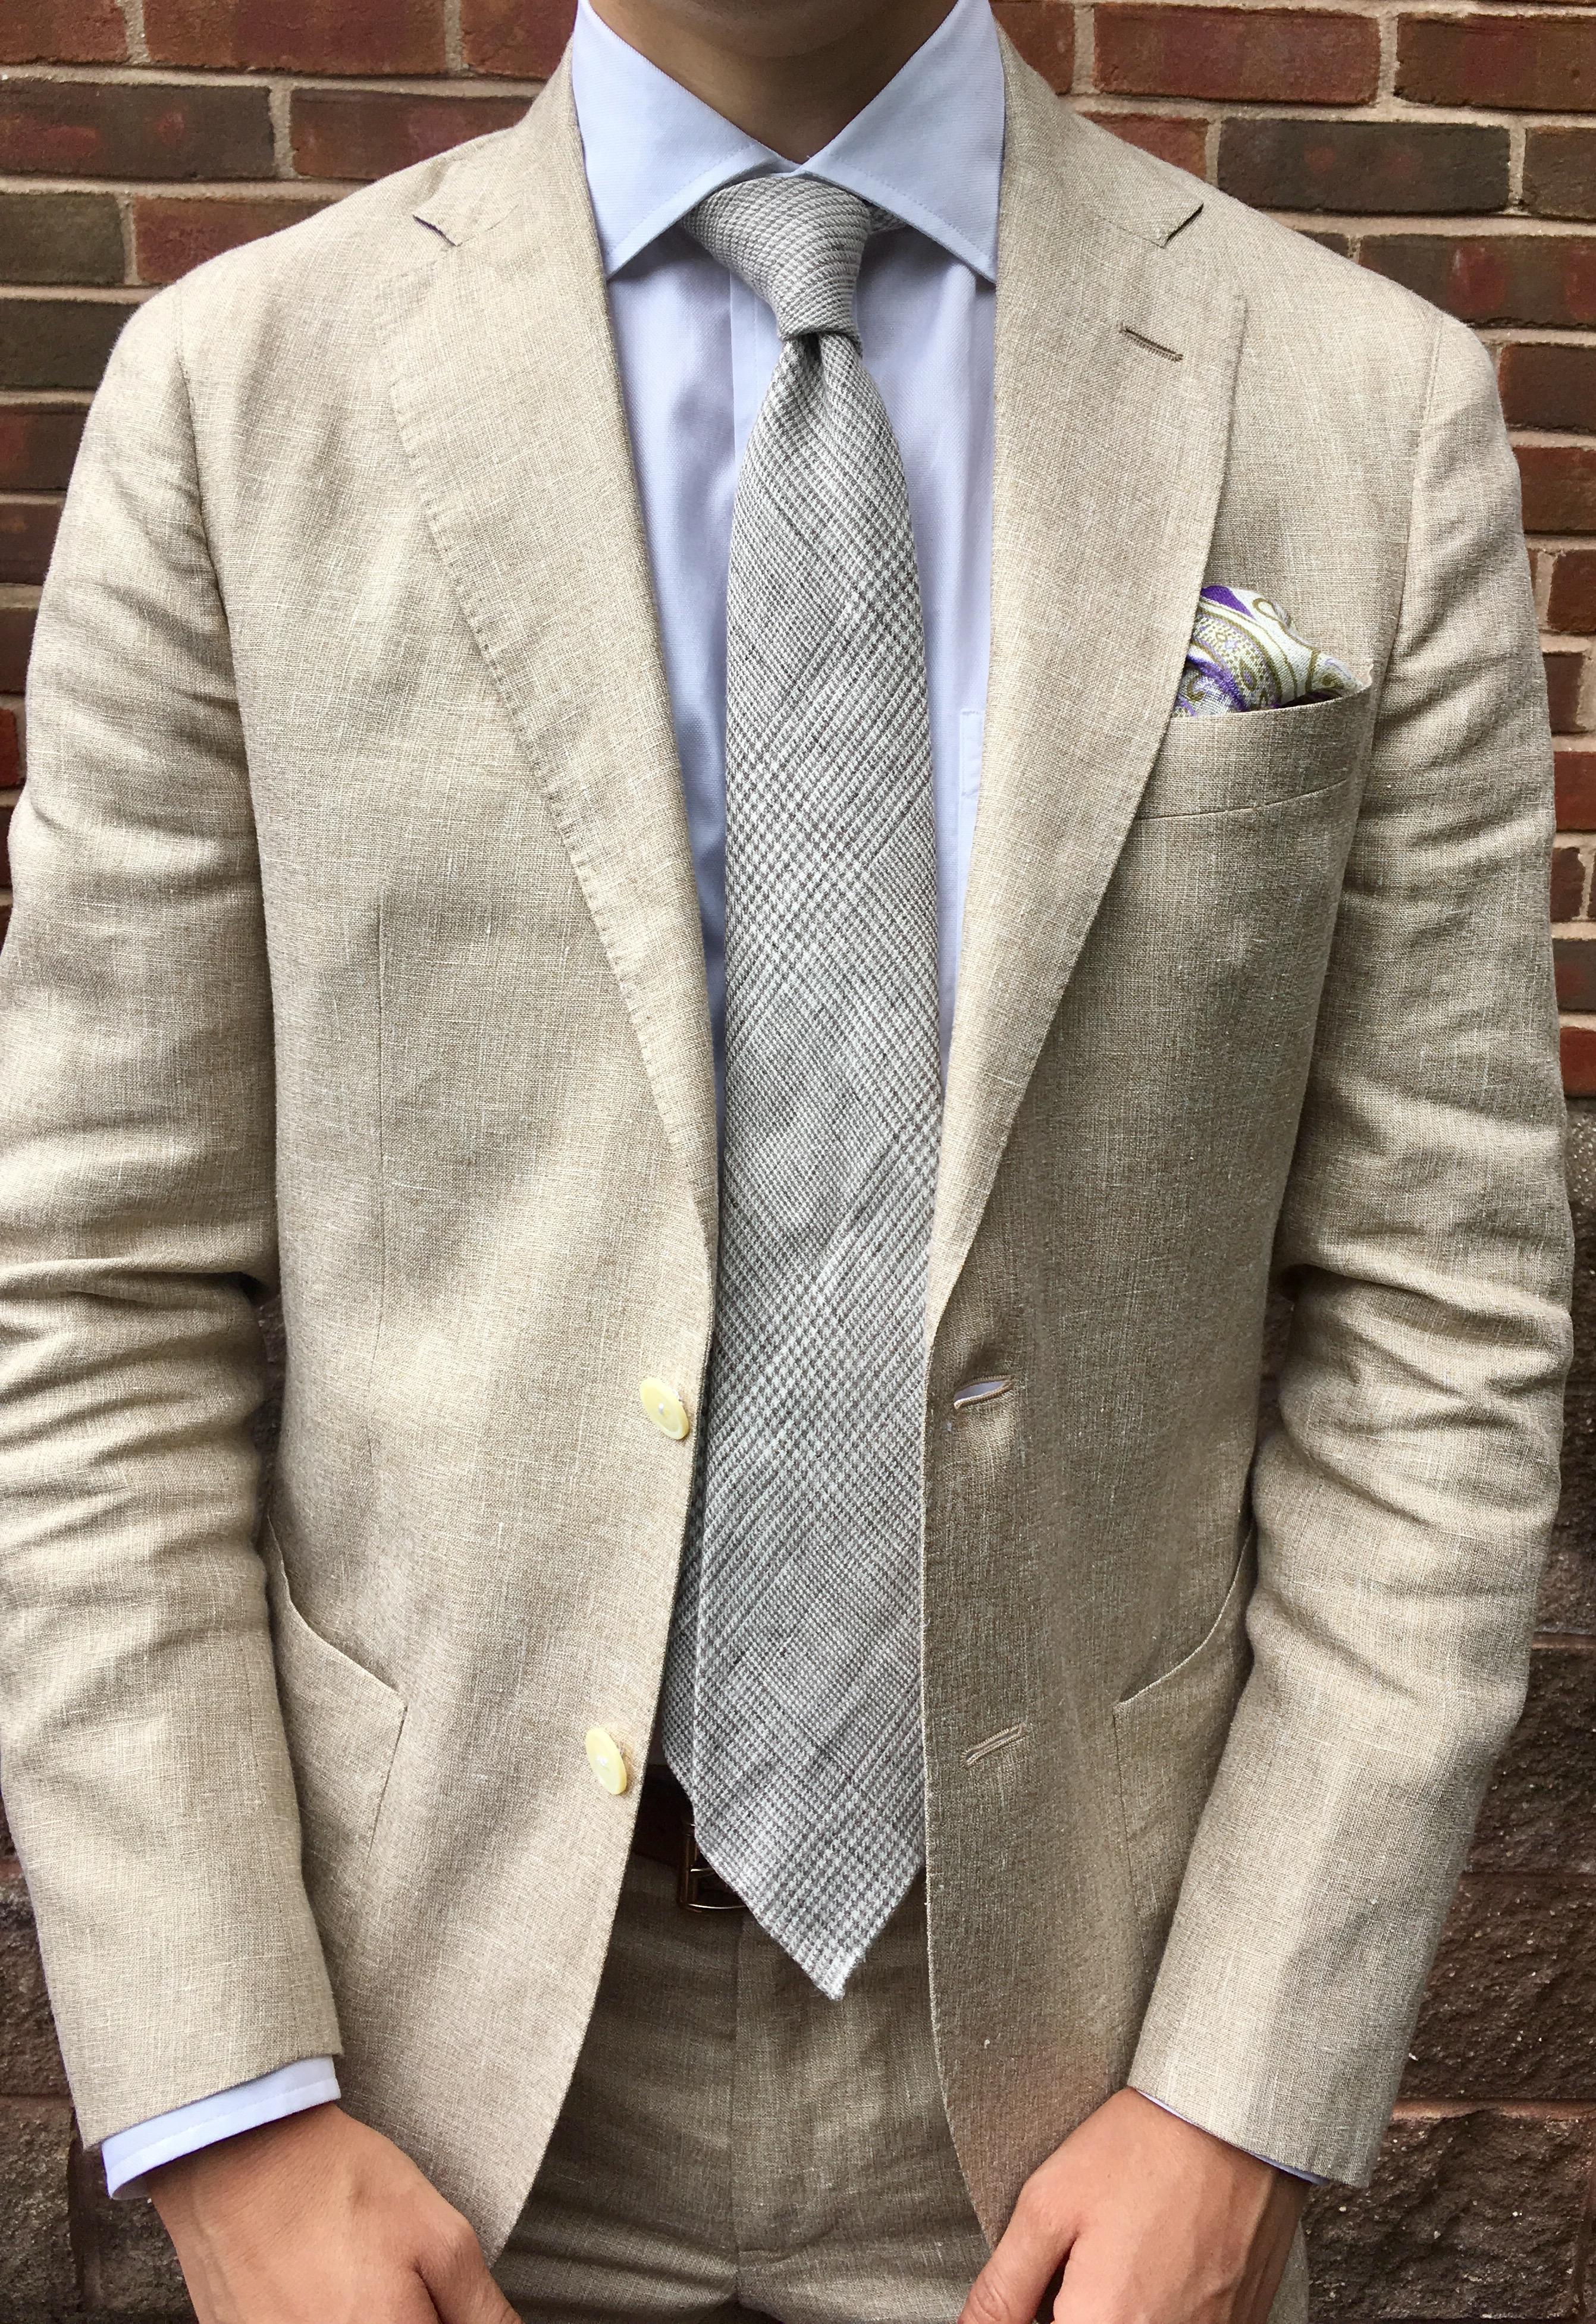 6a1bc1cd4b3b Vanda Fine Clothing - Official Affiliate Thread   Page 74   Styleforum